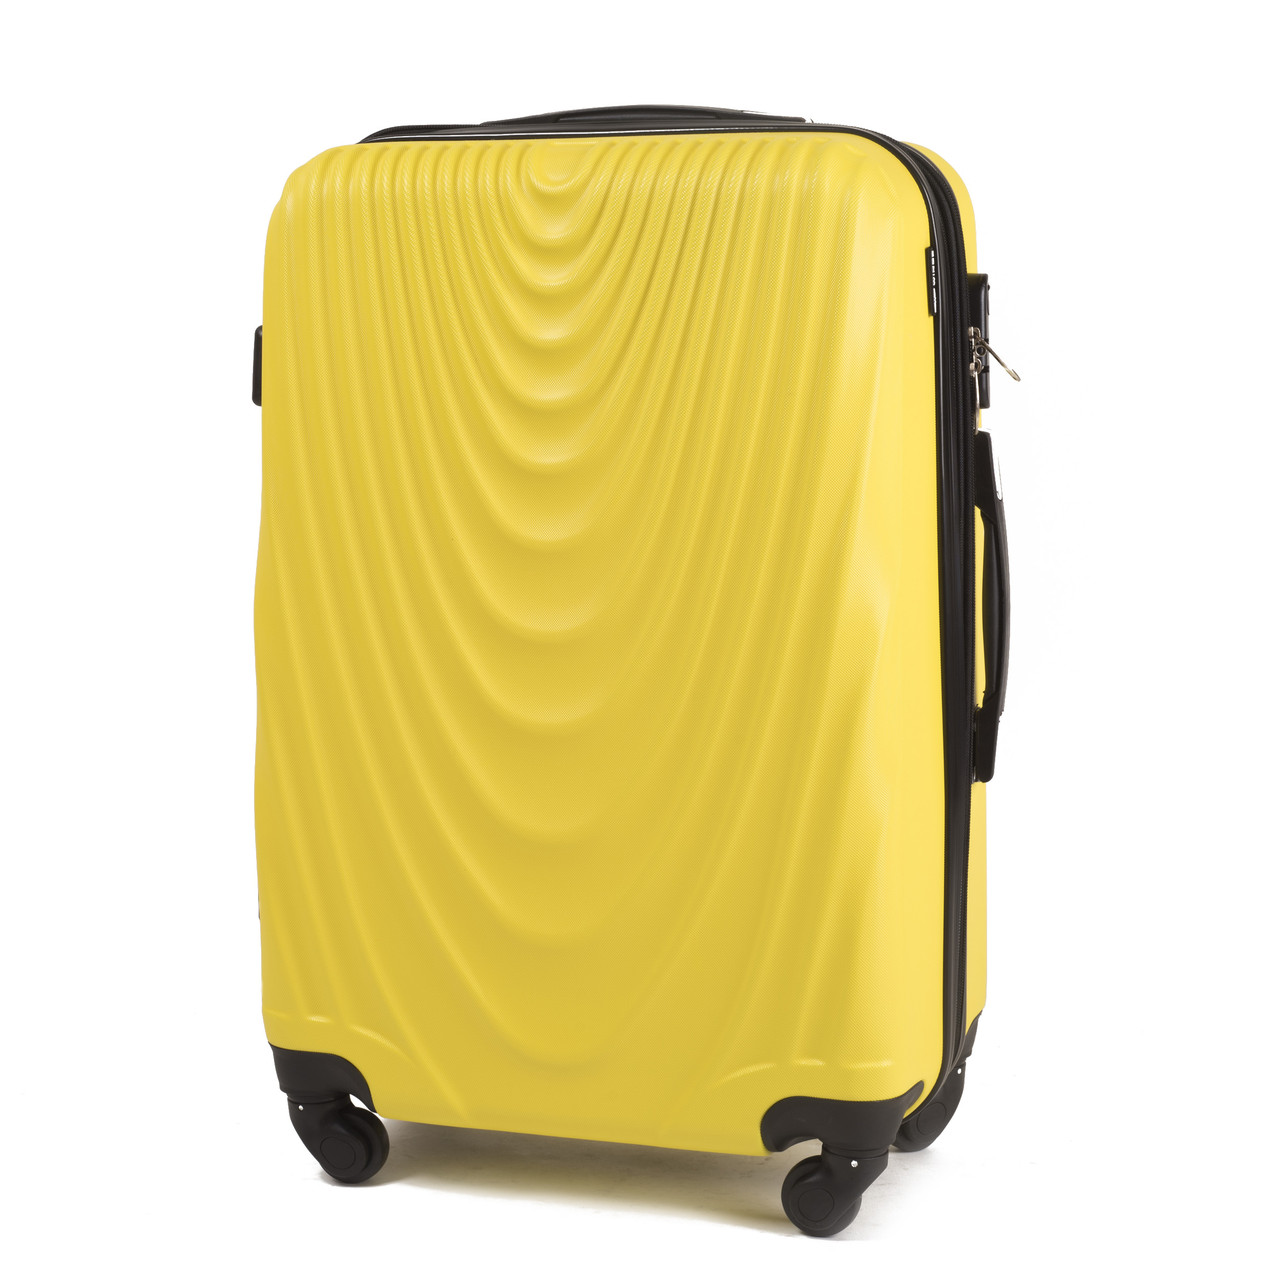 Чемодан Wings 305 пластиковый Средний (M) Желтый